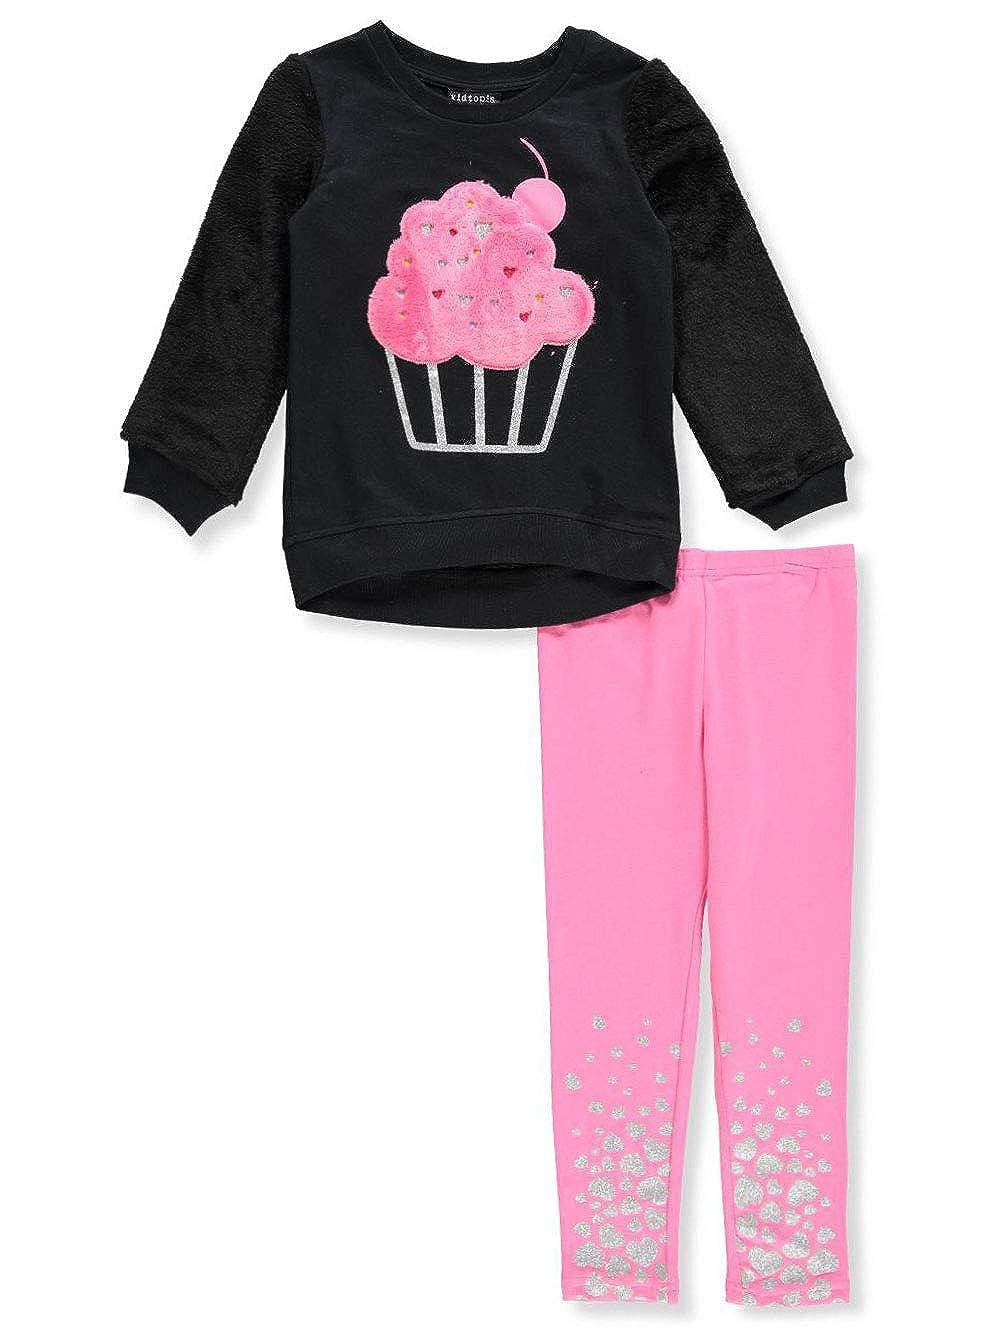 TOPSVI Kidtopia Girls' 2-Piece Leggings Set Outfit